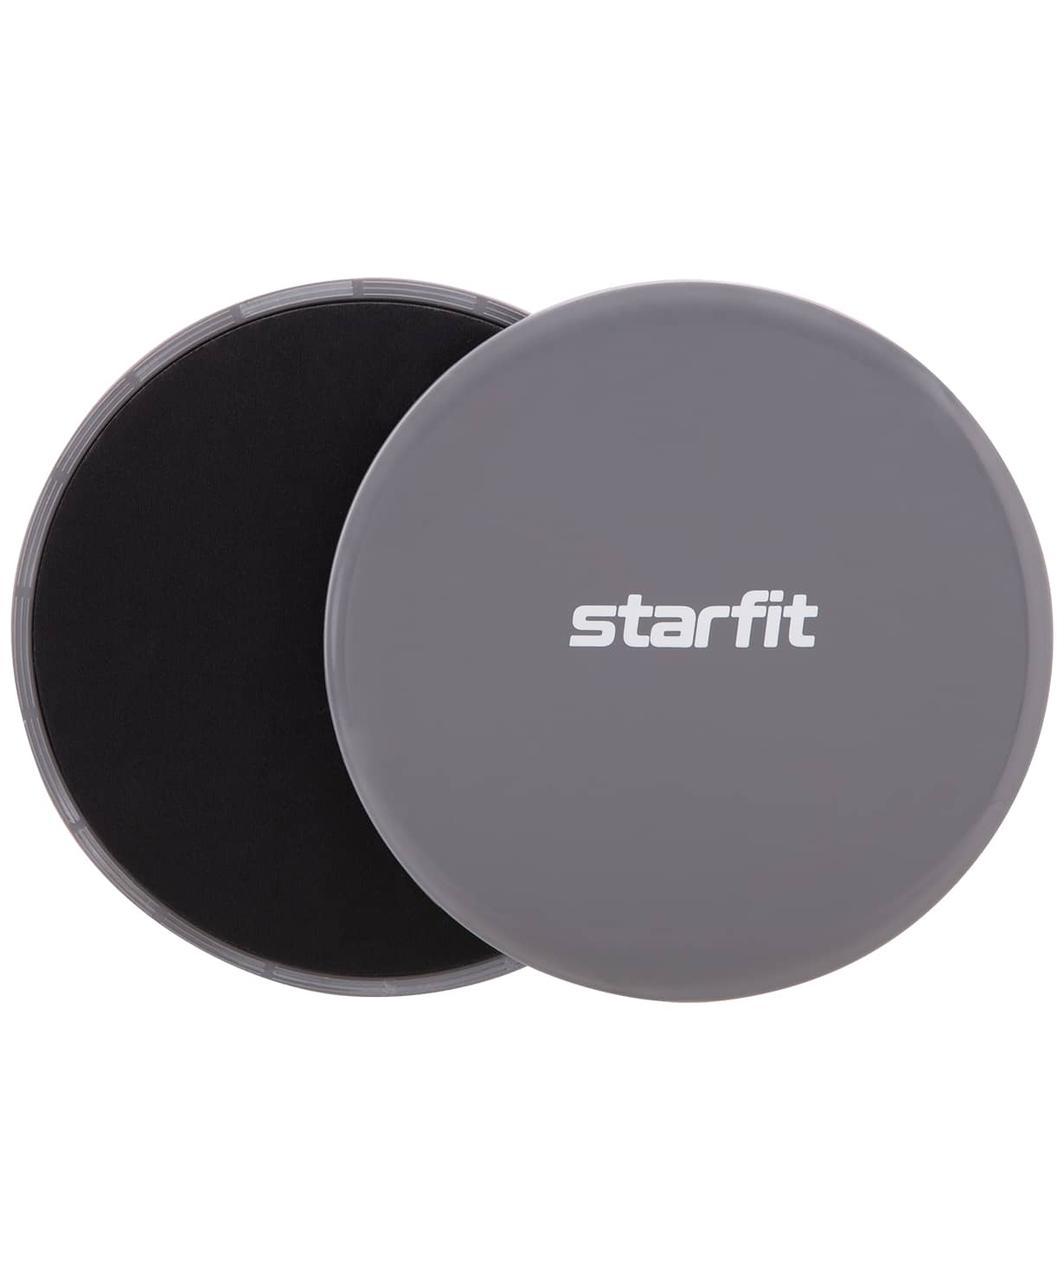 Слайдеры для фитнеса FS-101, серый/черный Starfit